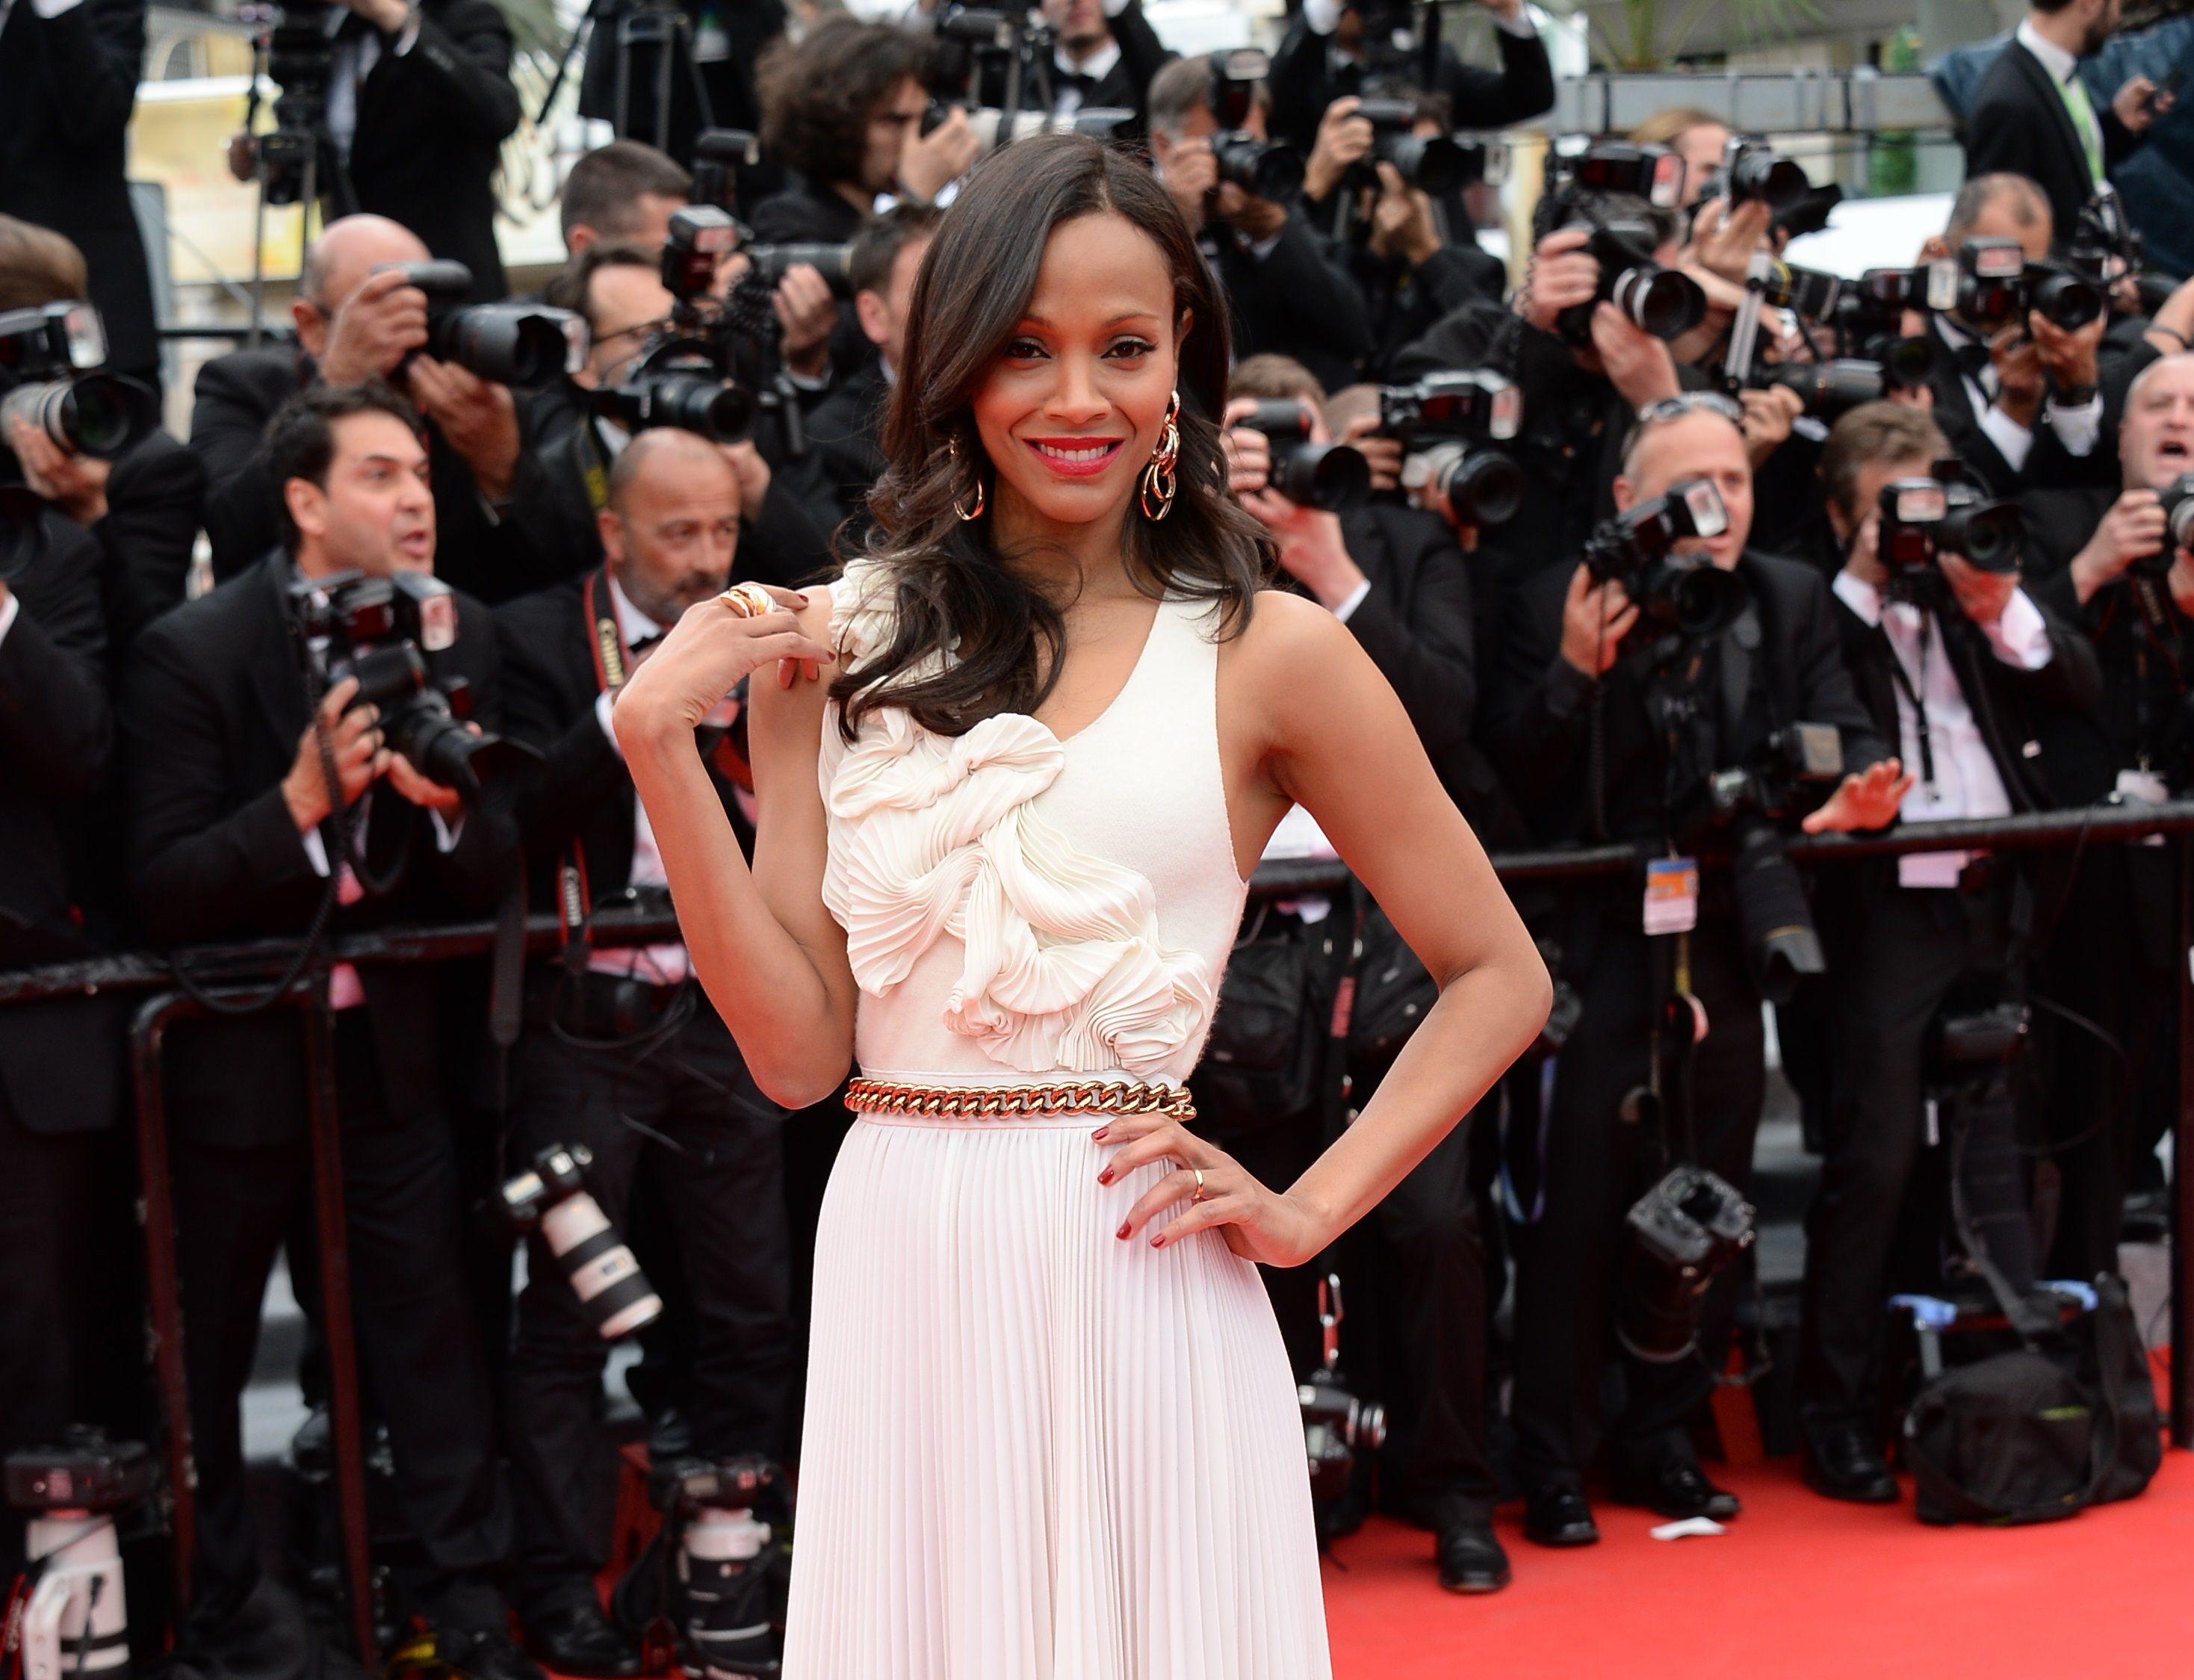 Zoe Saldana Festival de Cannes, 14.05.2014. Make up L